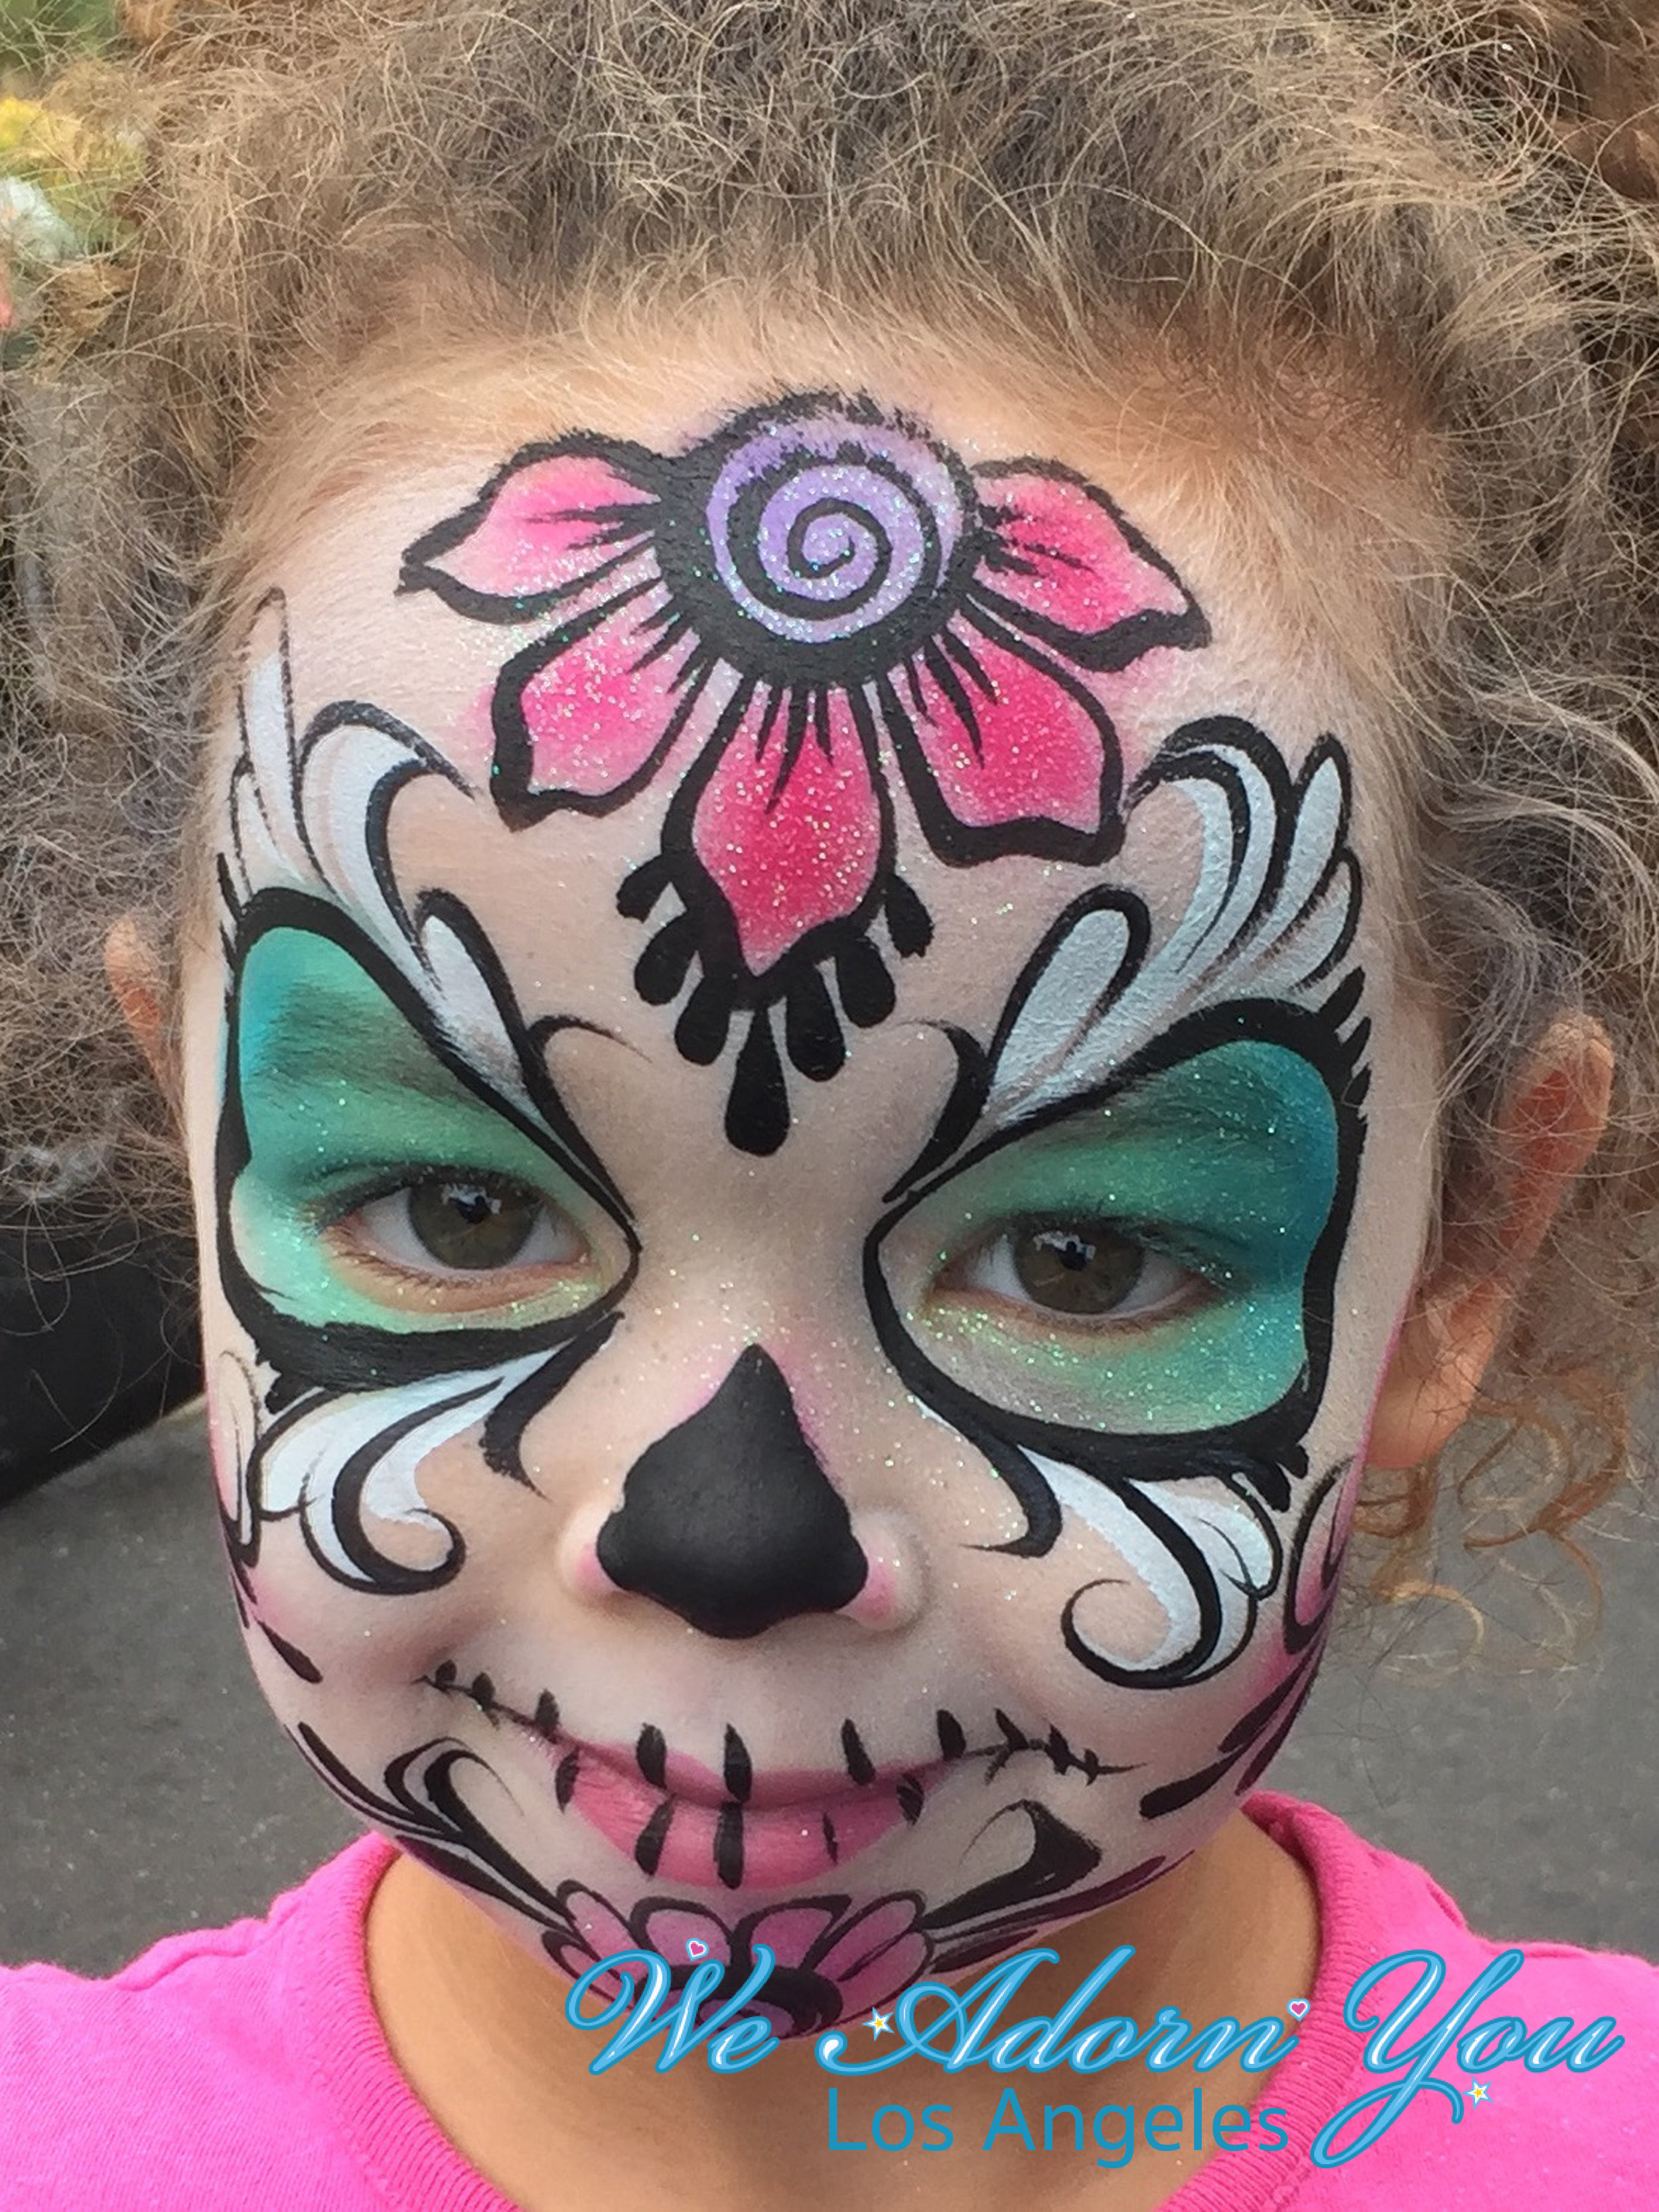 We Adorn You Los Angeles Face Painting Sugar Skull.jpg